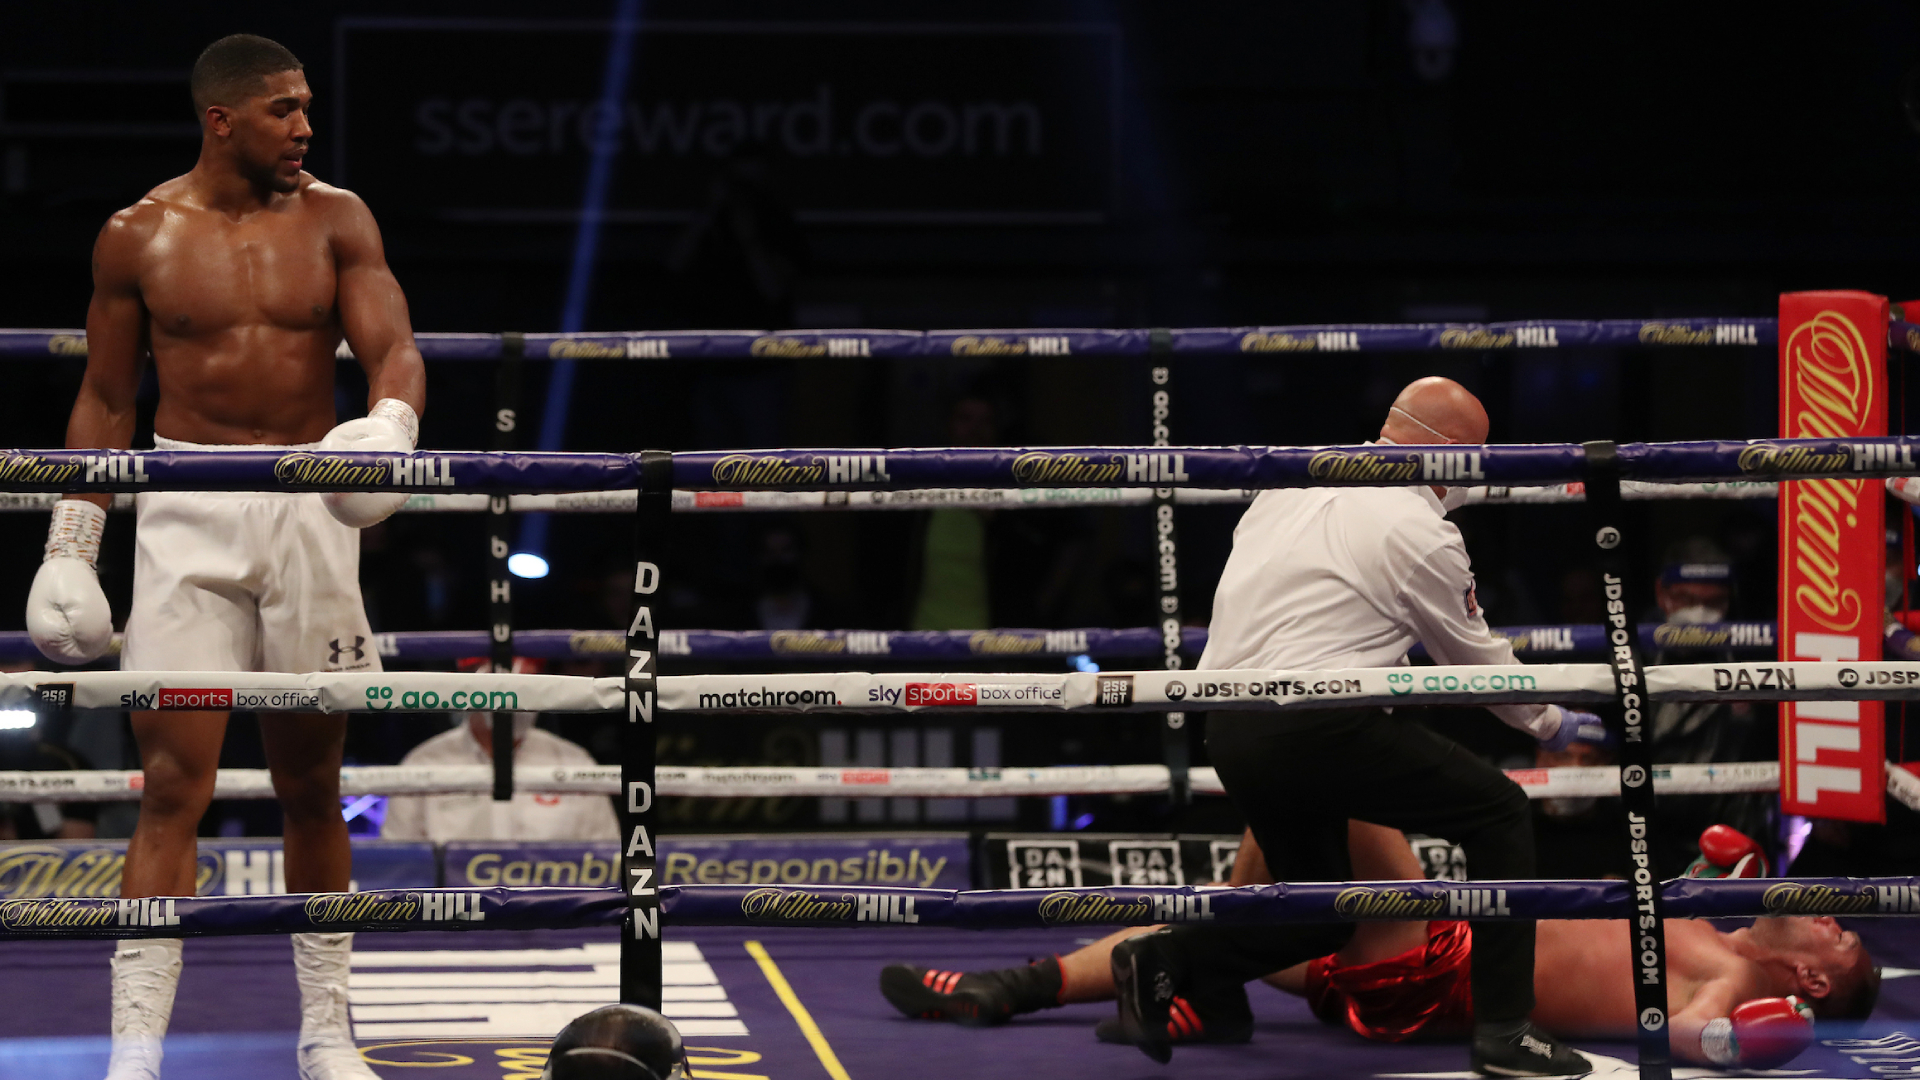 Anthony Joshua vs. Kubrat Pulev results: Joshua dominates with 9th-round KO  to retain titles   Sporting News